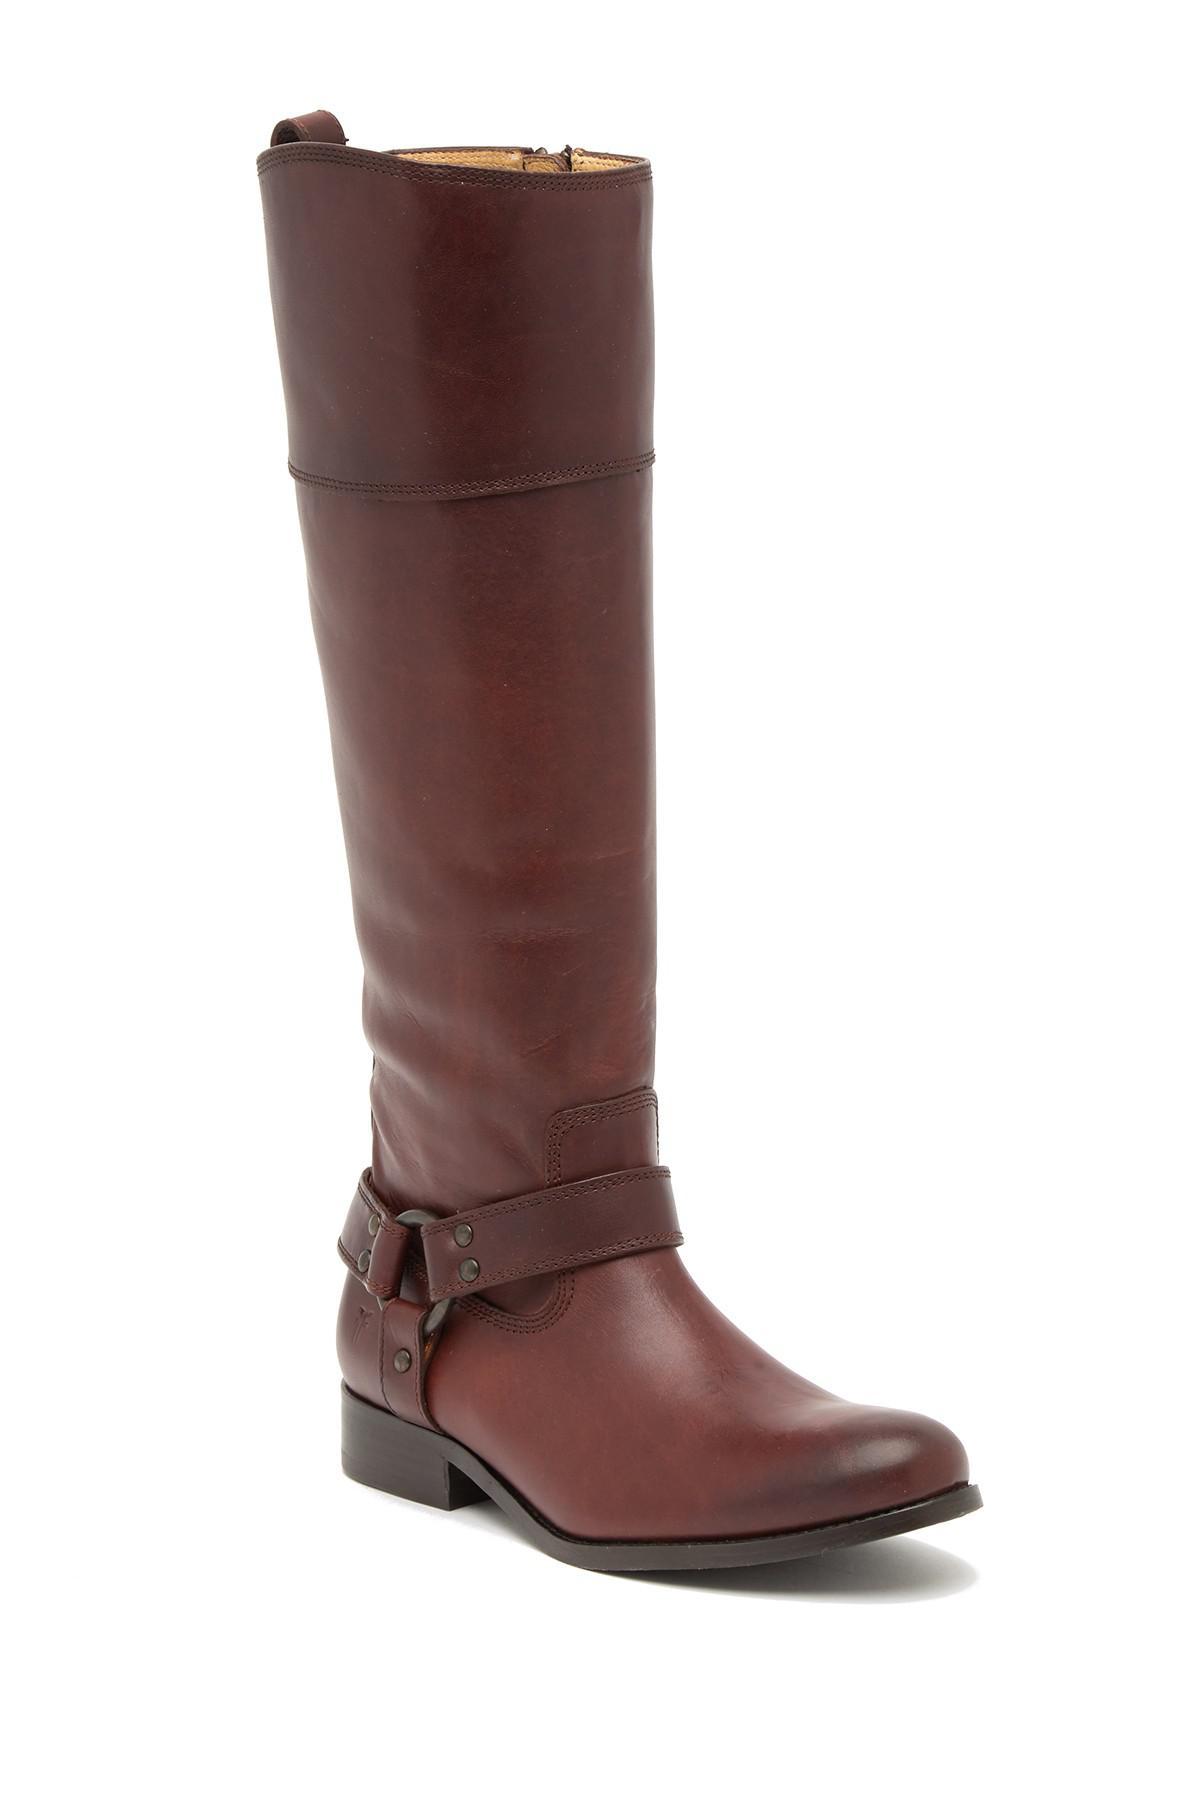 Lyst Frye Melissa Knee High Boot Women In Brown